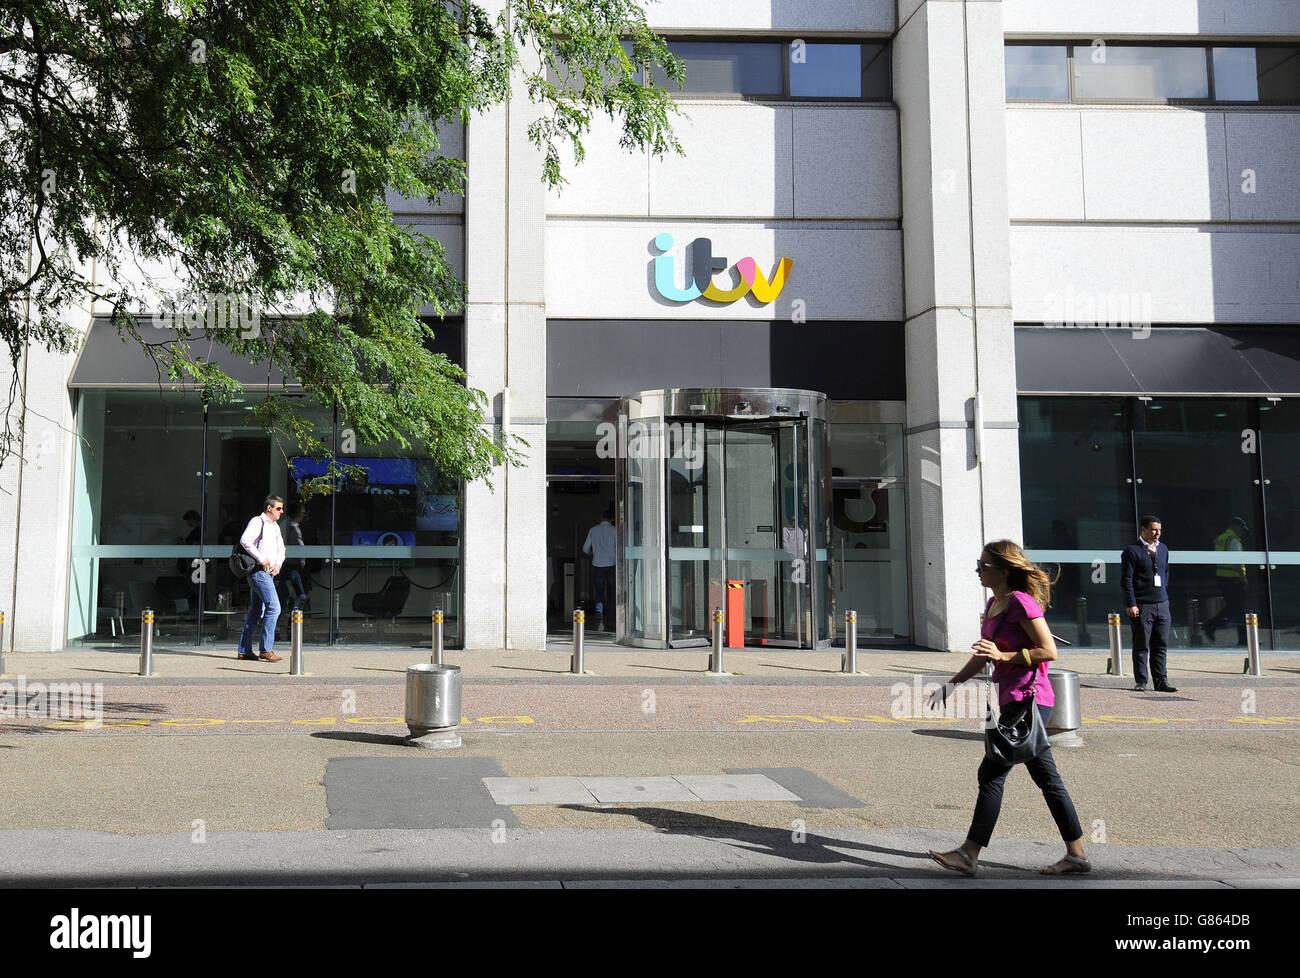 ITV Studios evacuated - Stock Image